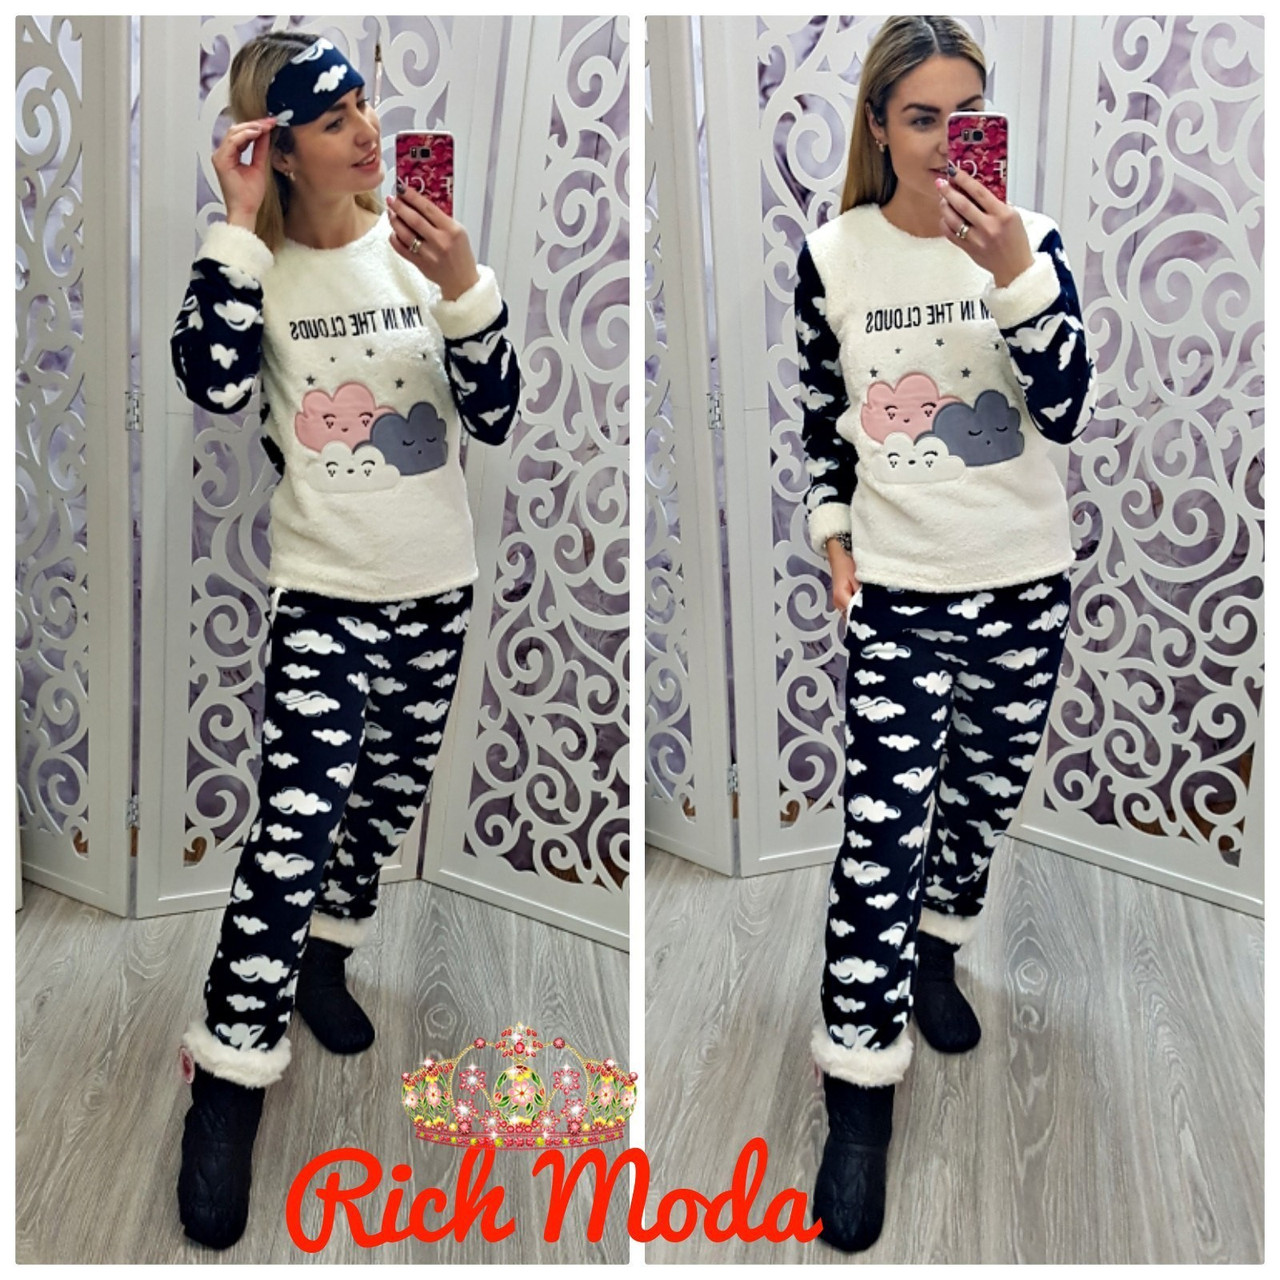 785a8b53c1e5 Домашний костюм очень тёплый, пижама. Турция, Размер 48-50, цена 599 ...